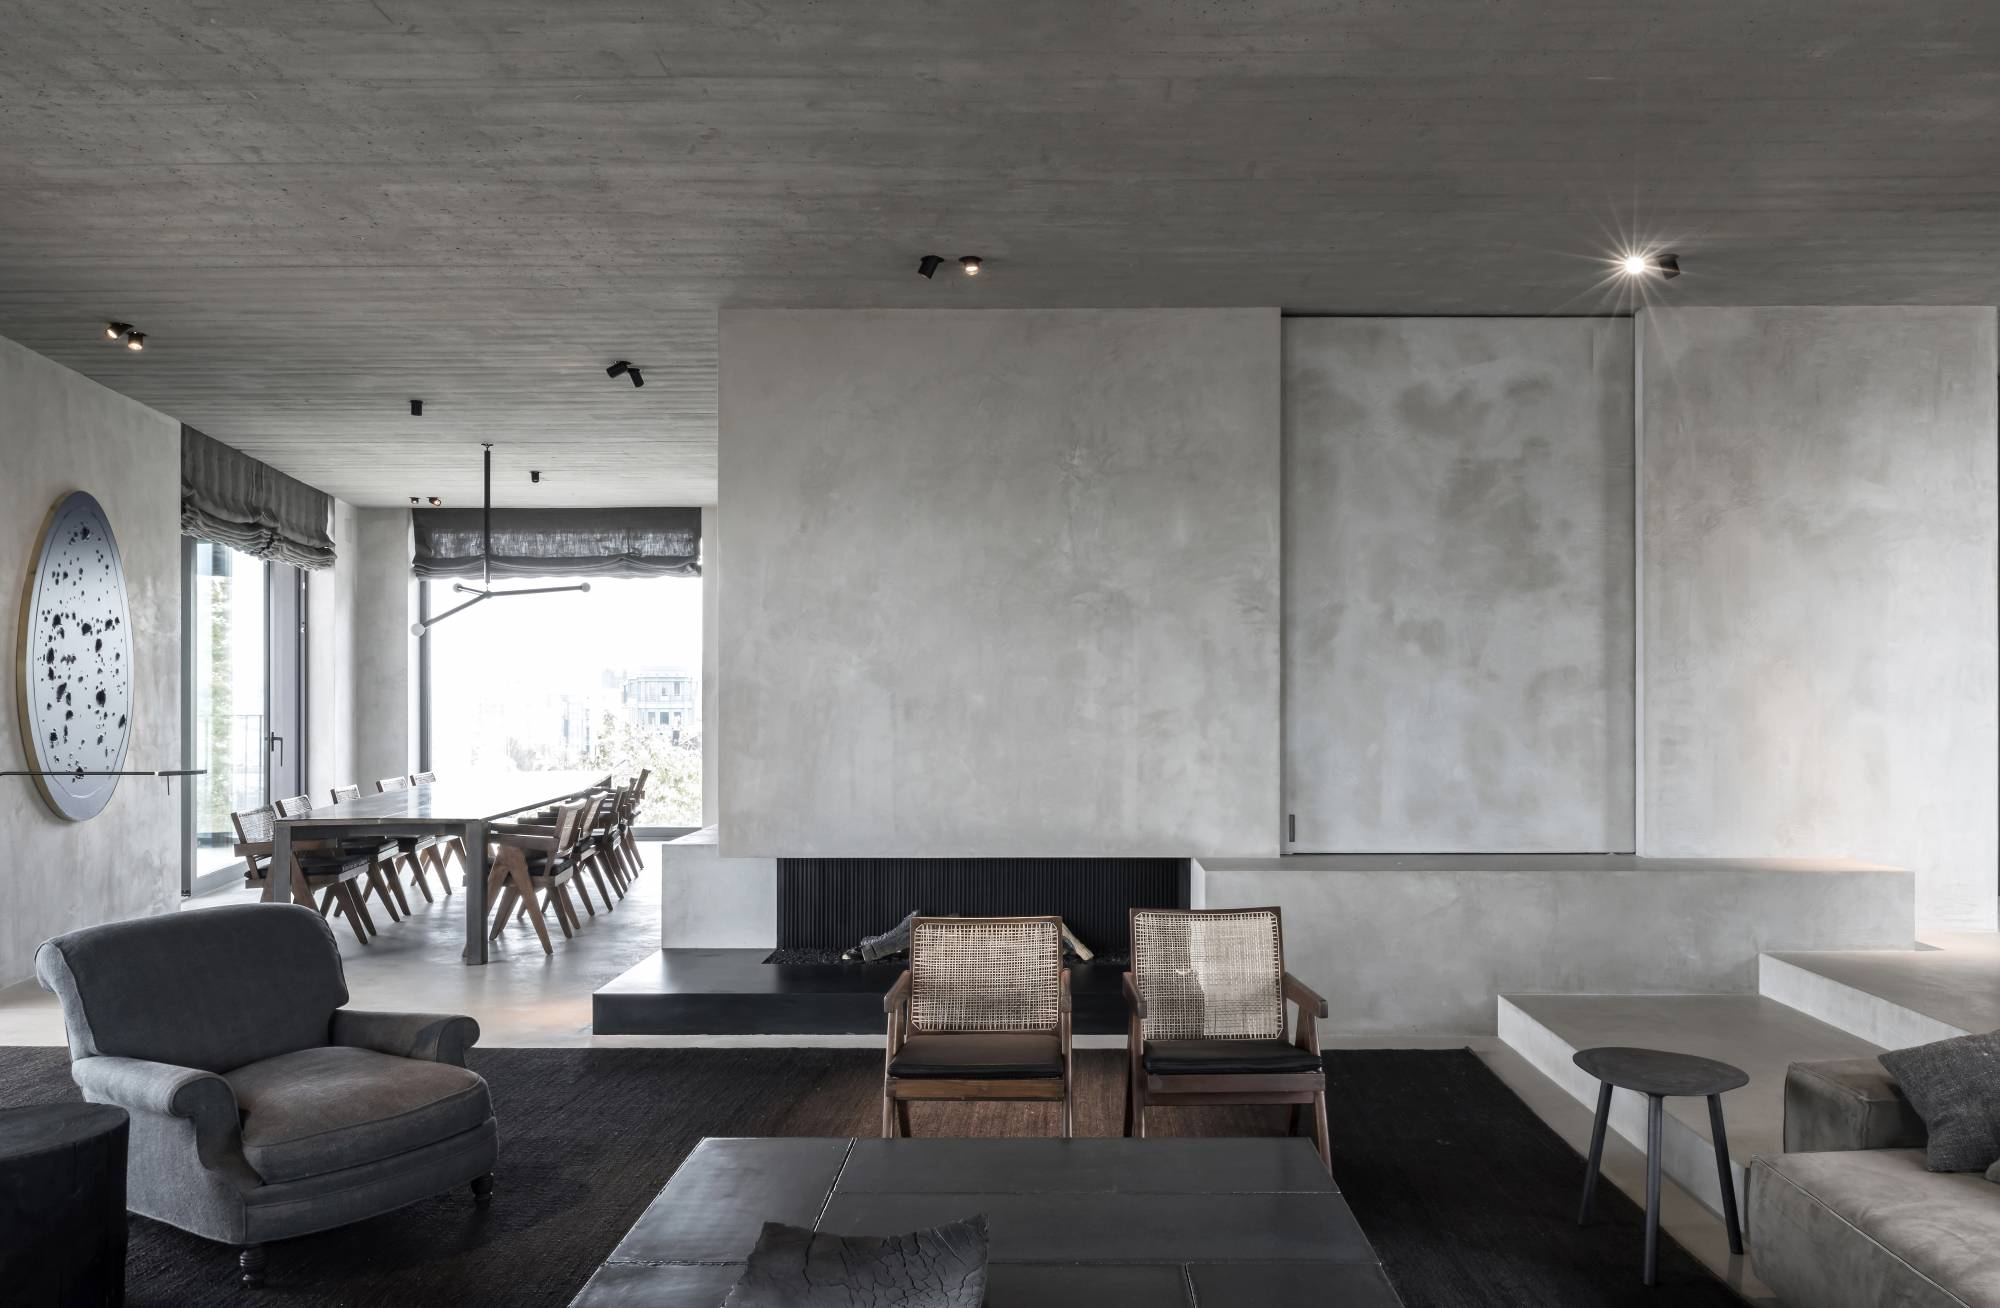 el c penthouse de van duysen ofrece una singular panor mica de amberes despiertaymira. Black Bedroom Furniture Sets. Home Design Ideas